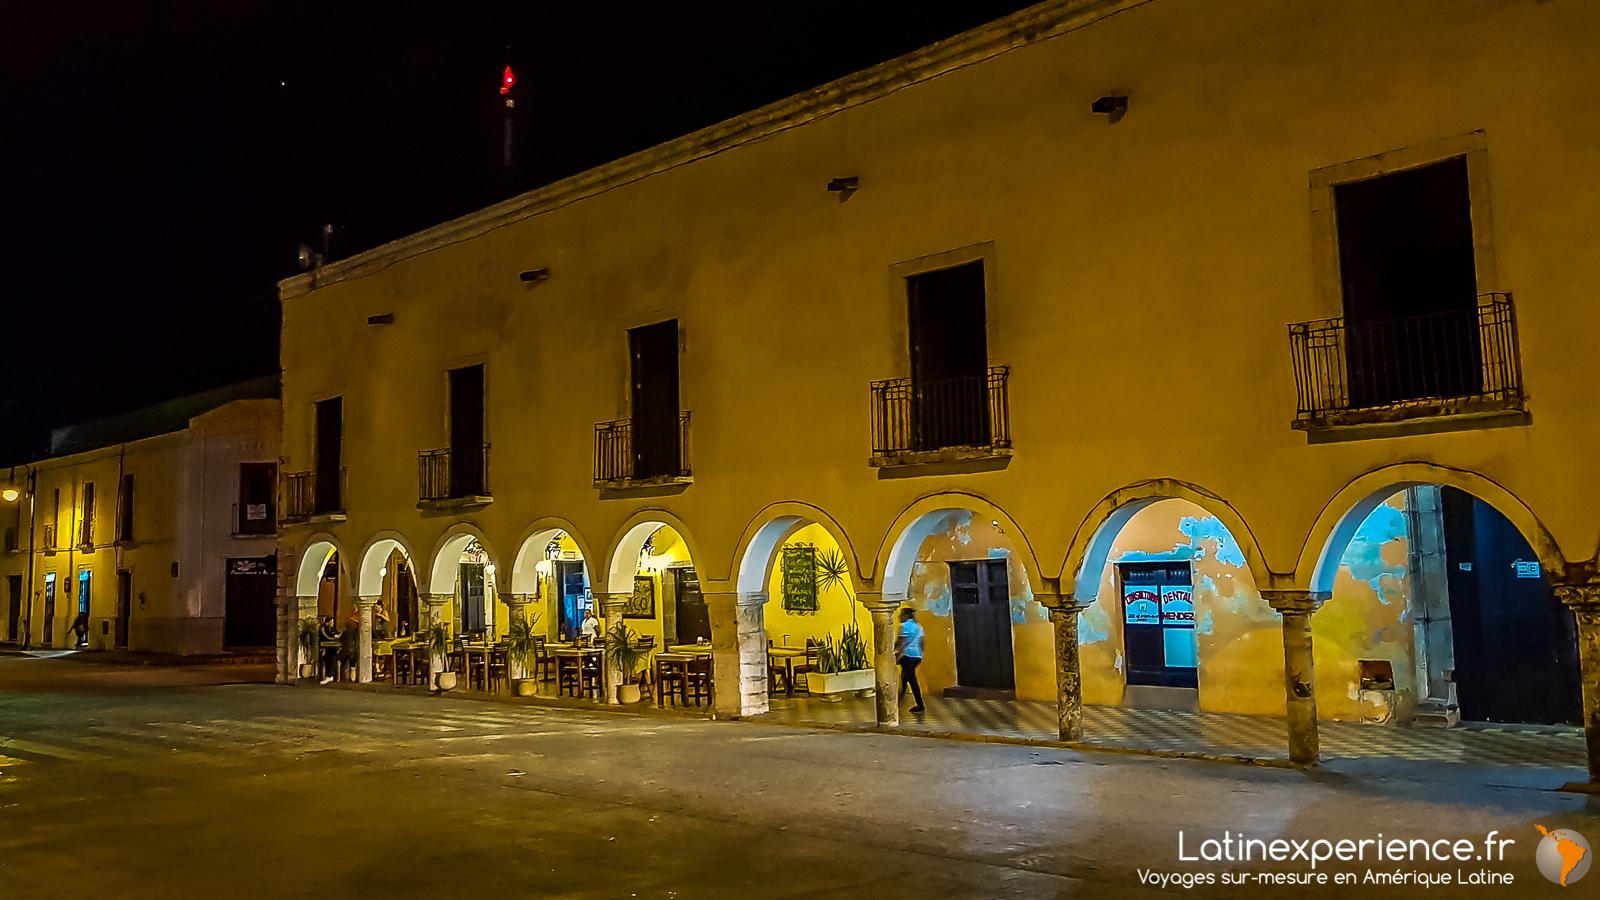 Mexique - Valladolid - Latinexperience voyages